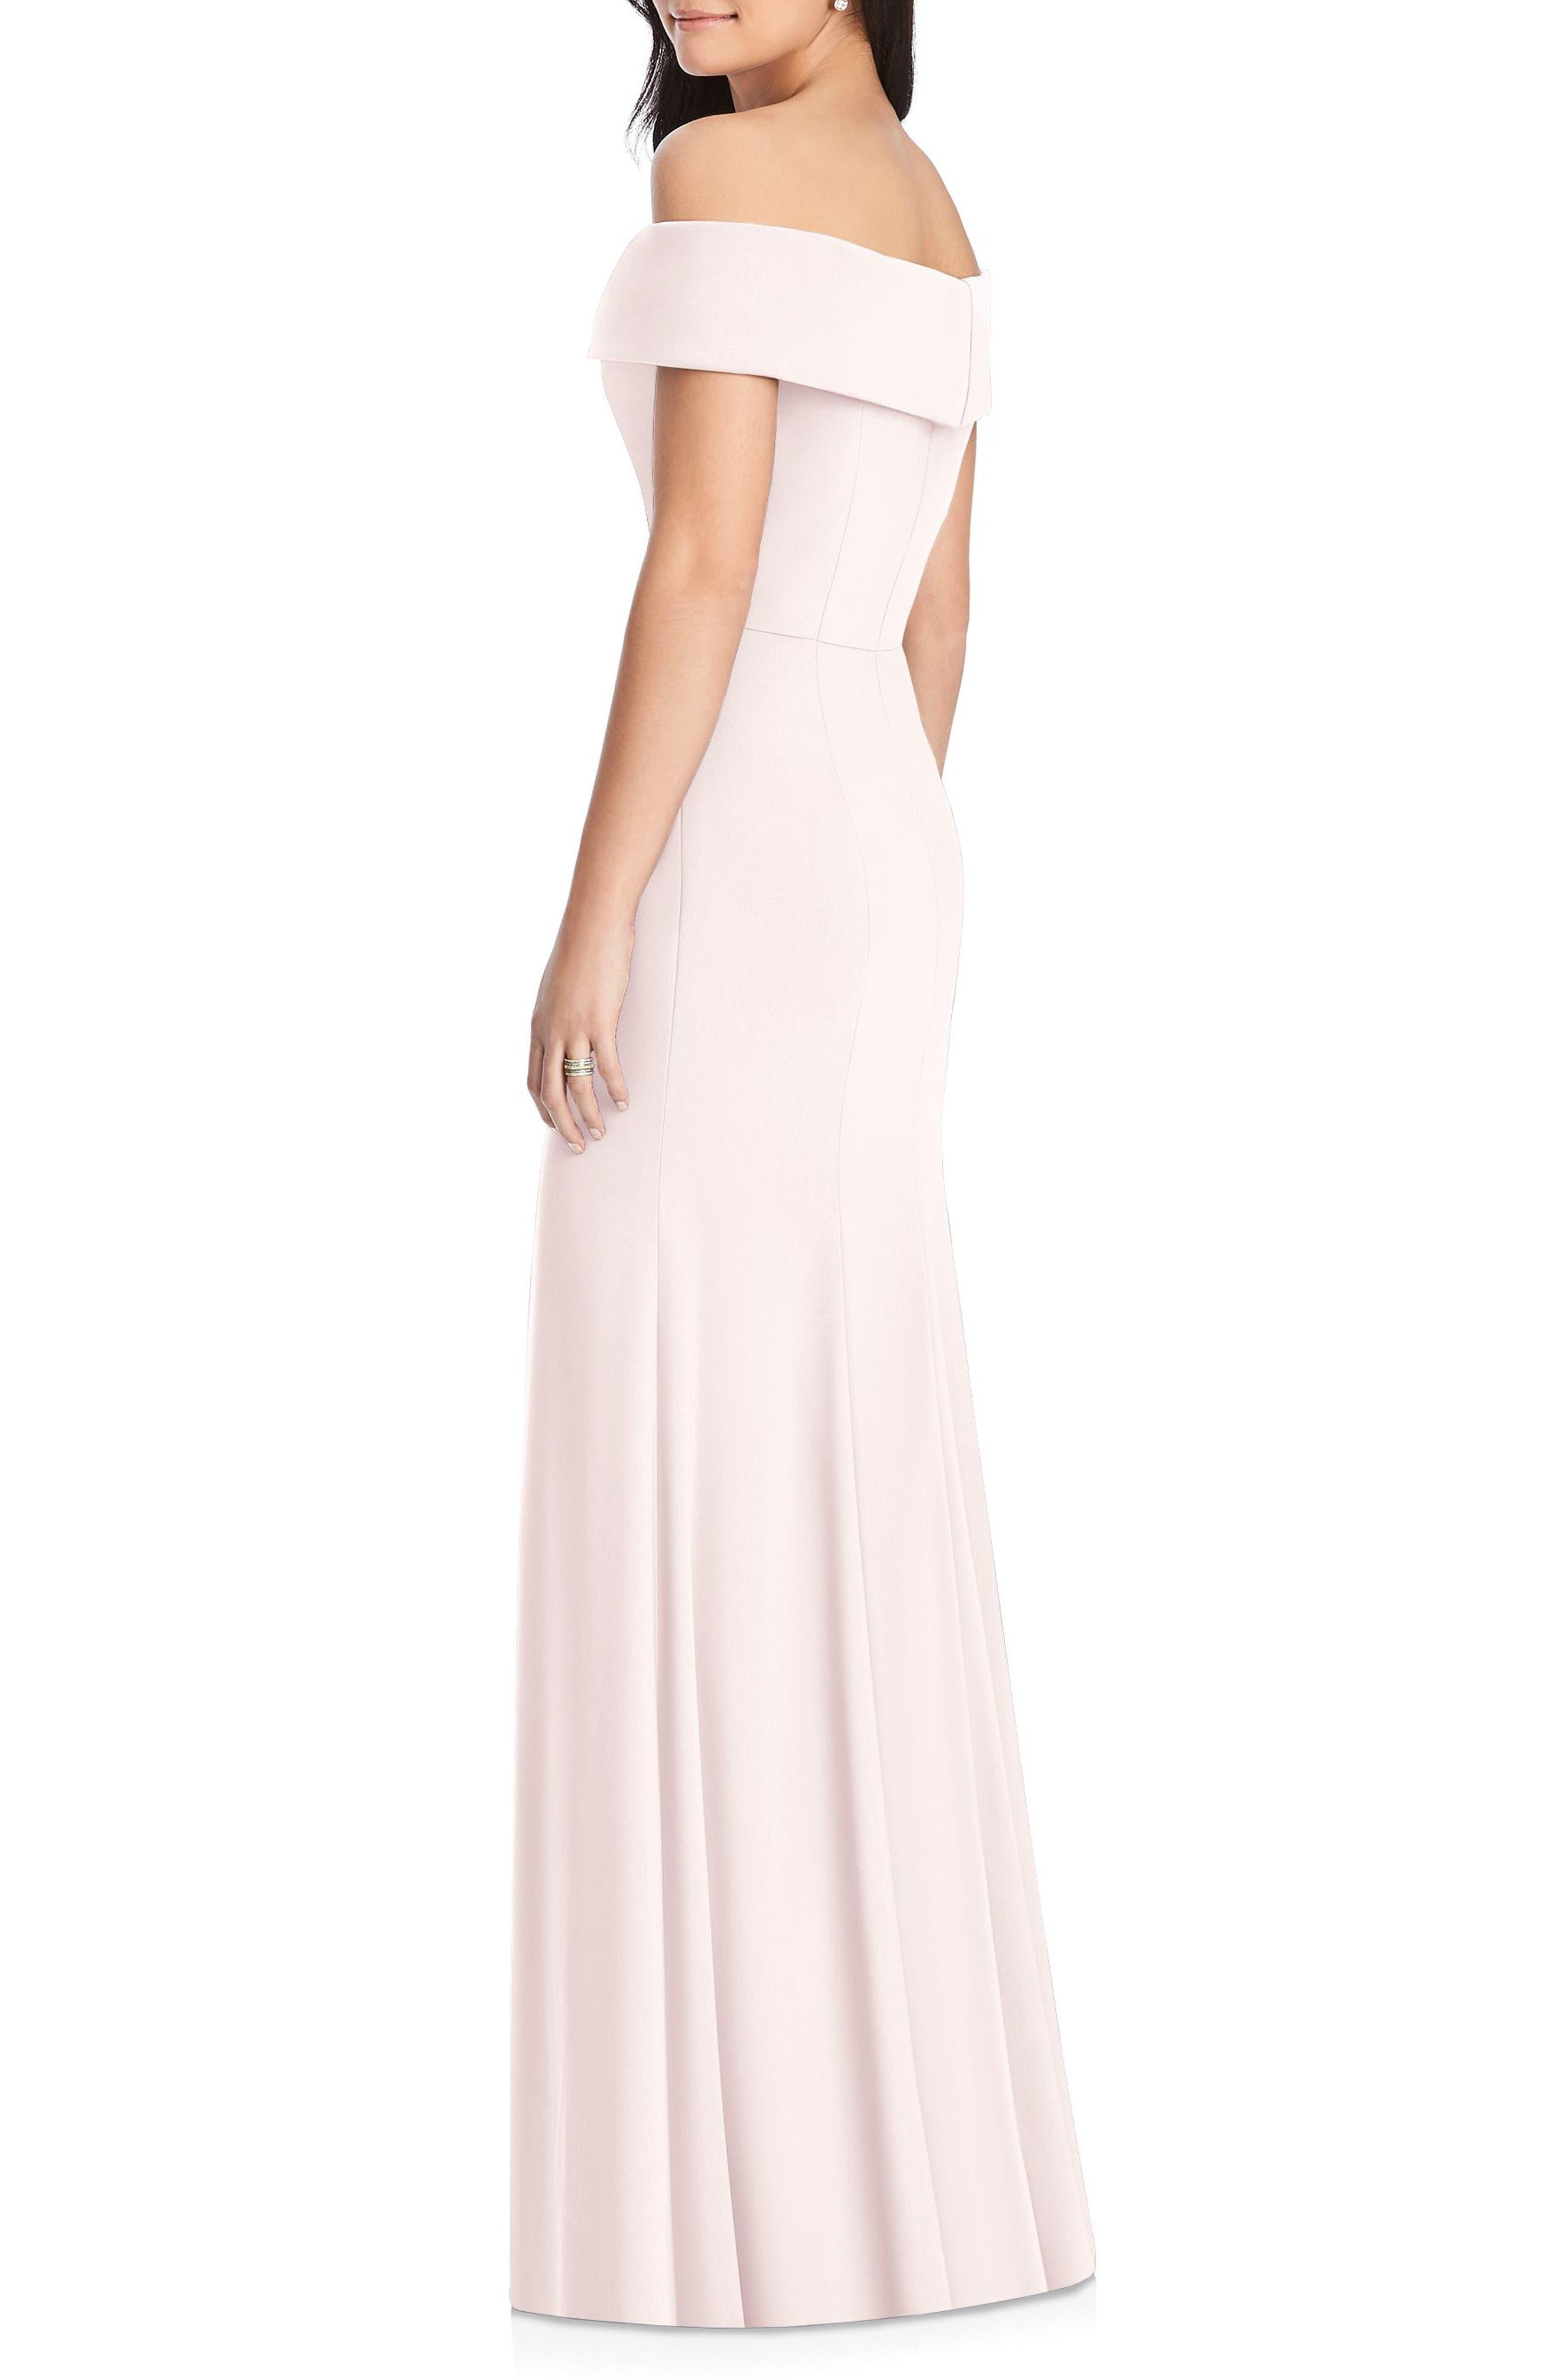 DESSY COLLECTION, Off the Shoulder Side Slit Crepe Gown, Alternate thumbnail 2, color, BLUSH